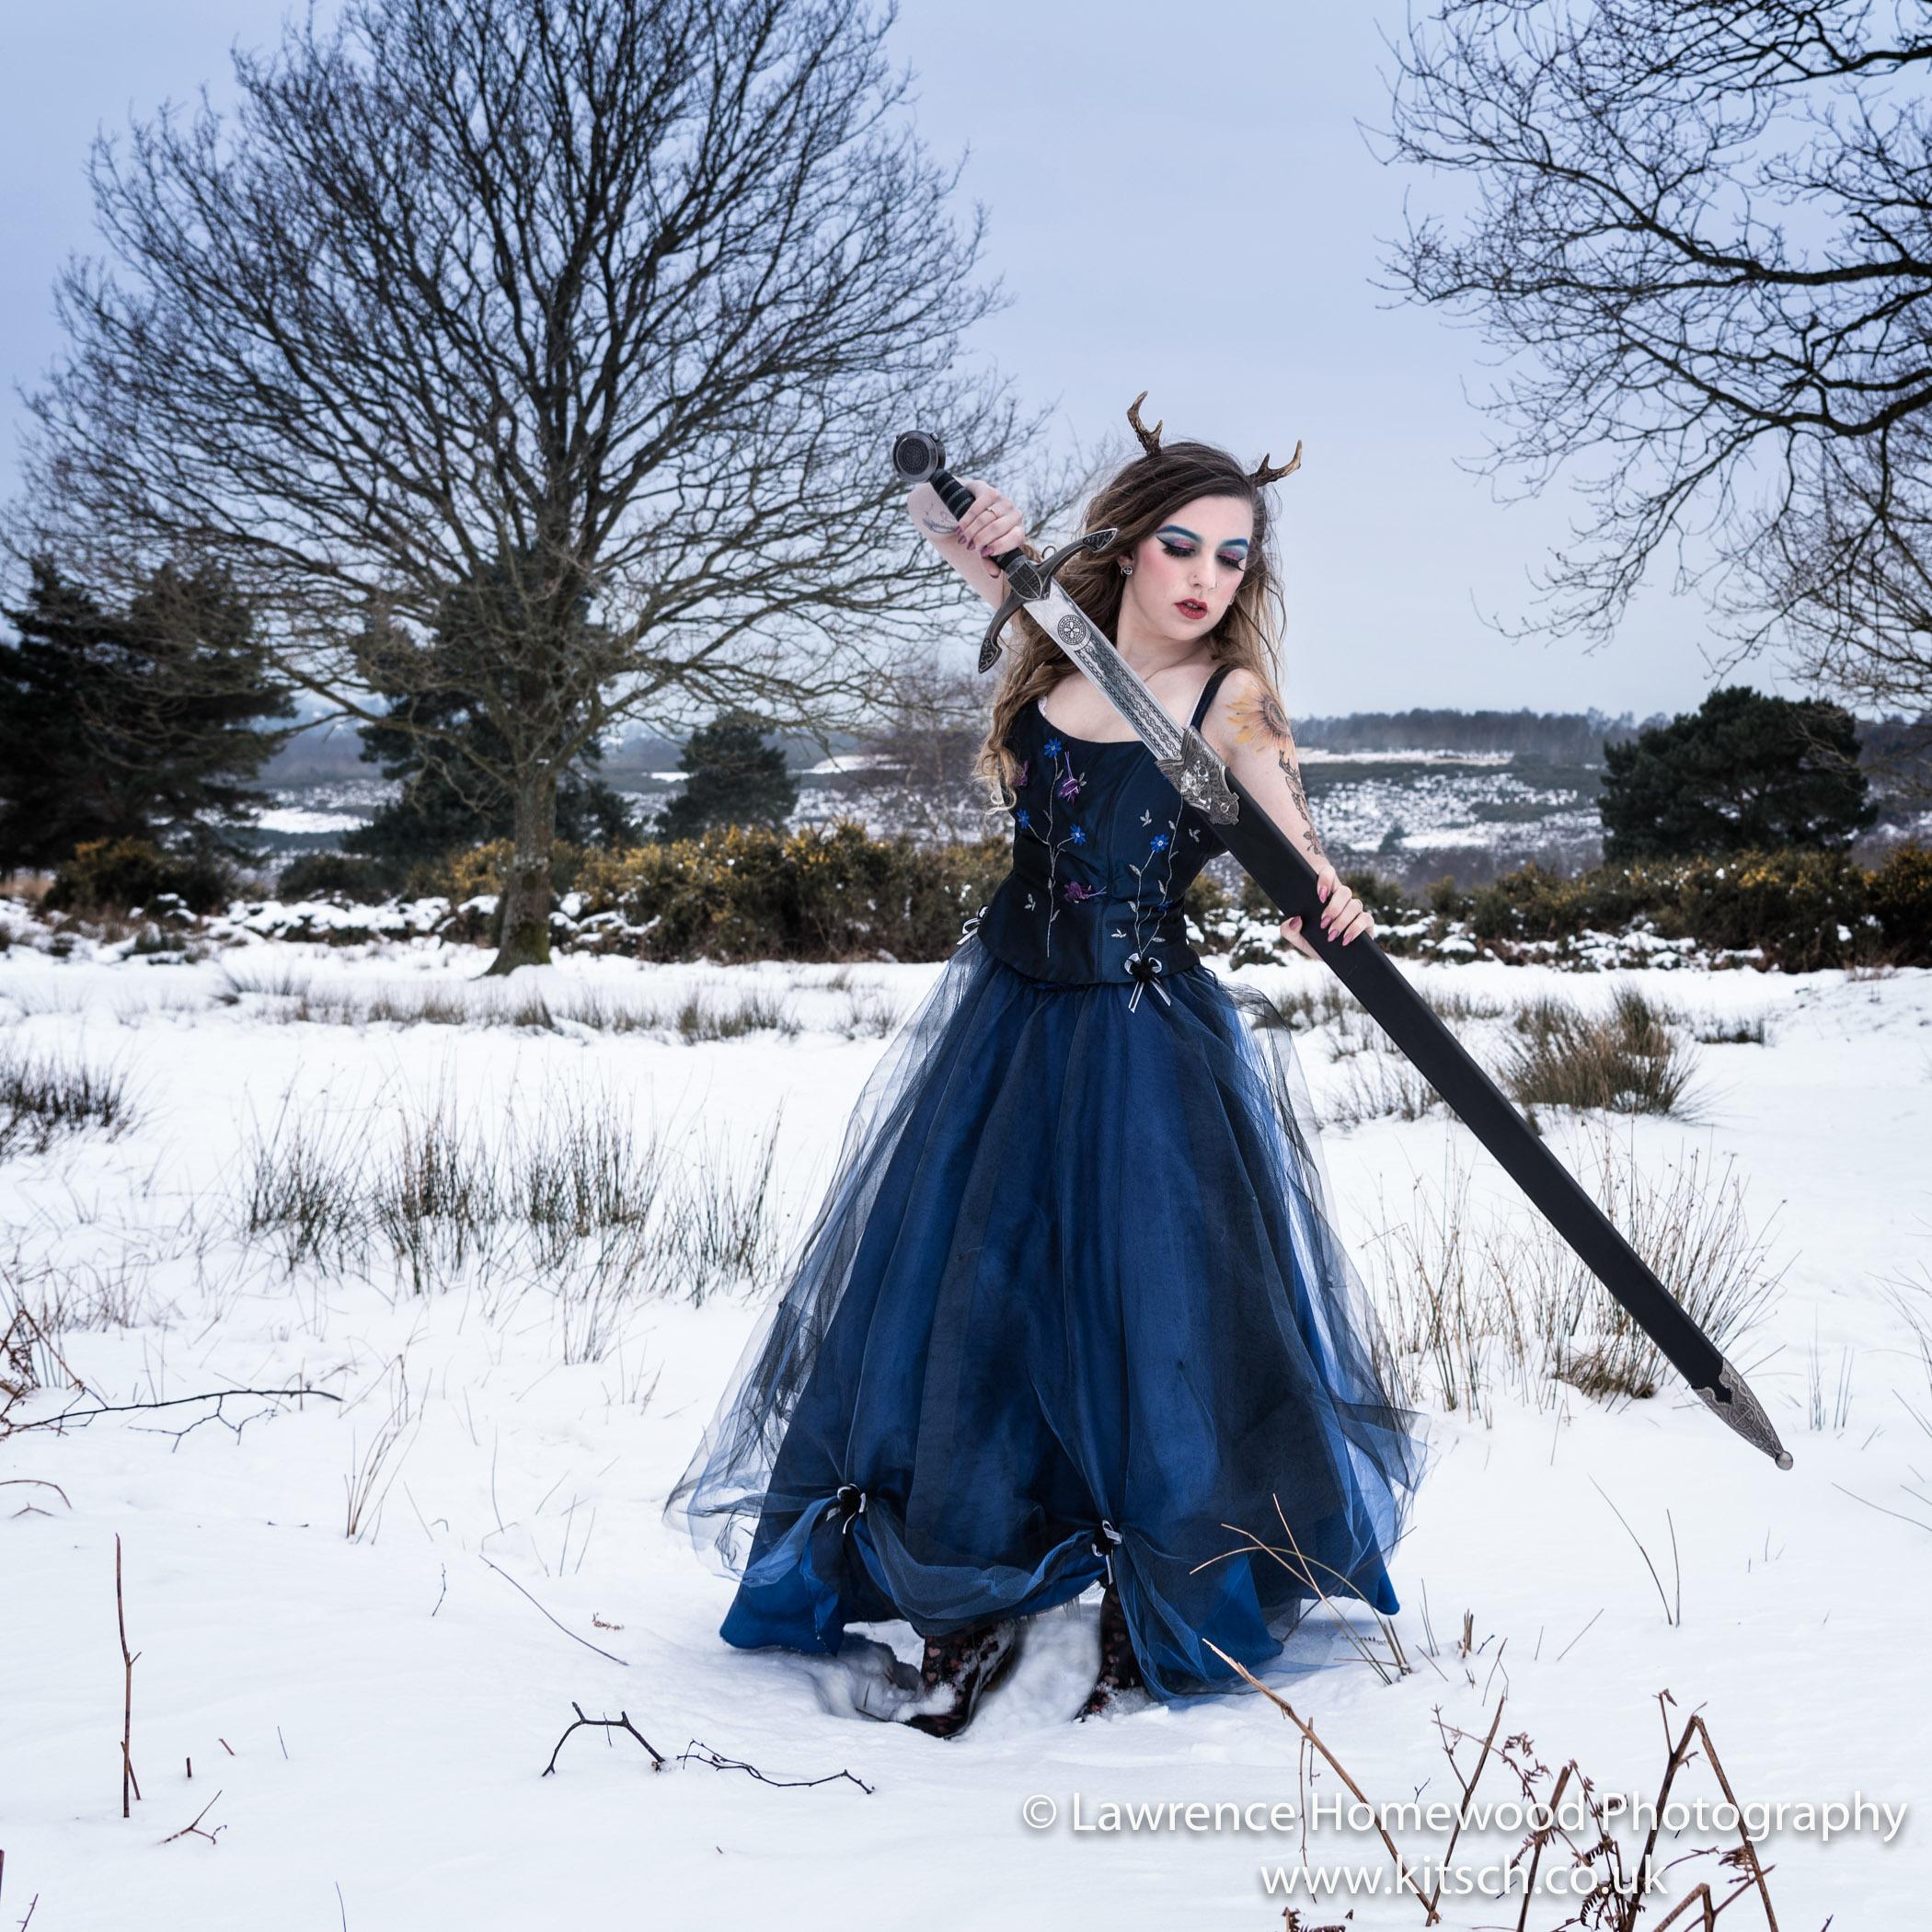 Fawn Princess - A Winters Tale27